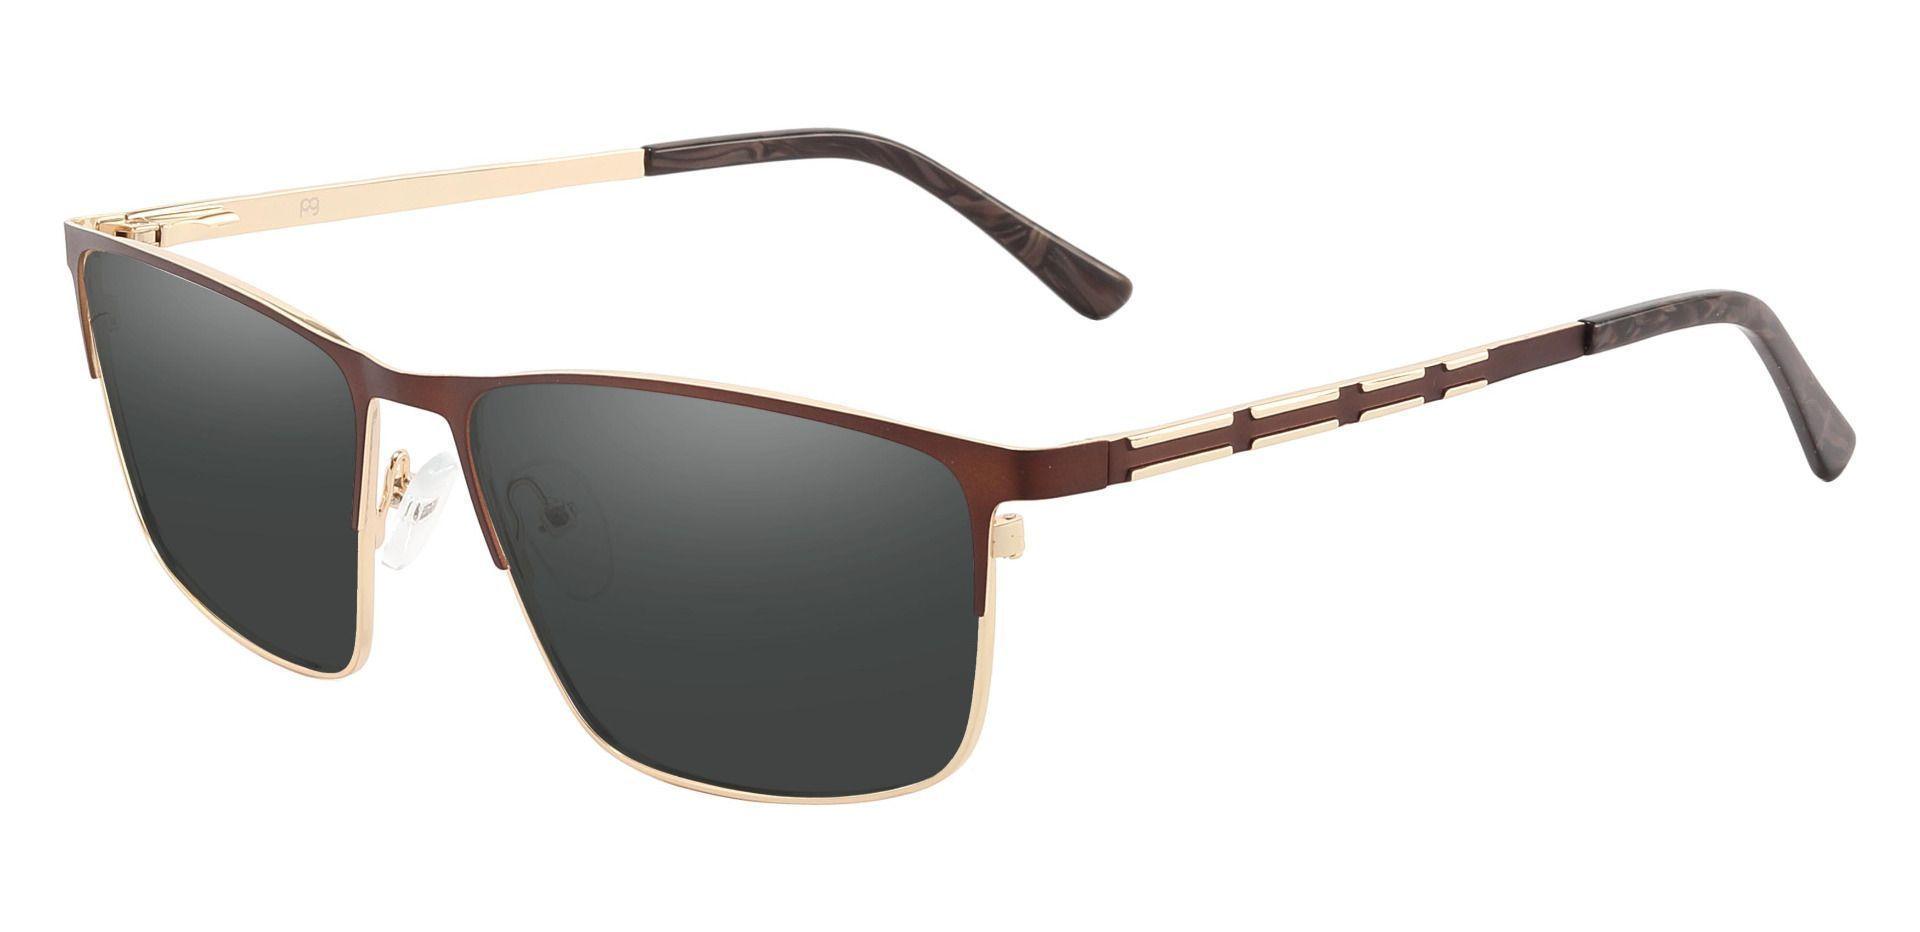 Hamlet Browline Prescription Sunglasses - Brown Frame With Gray Lenses